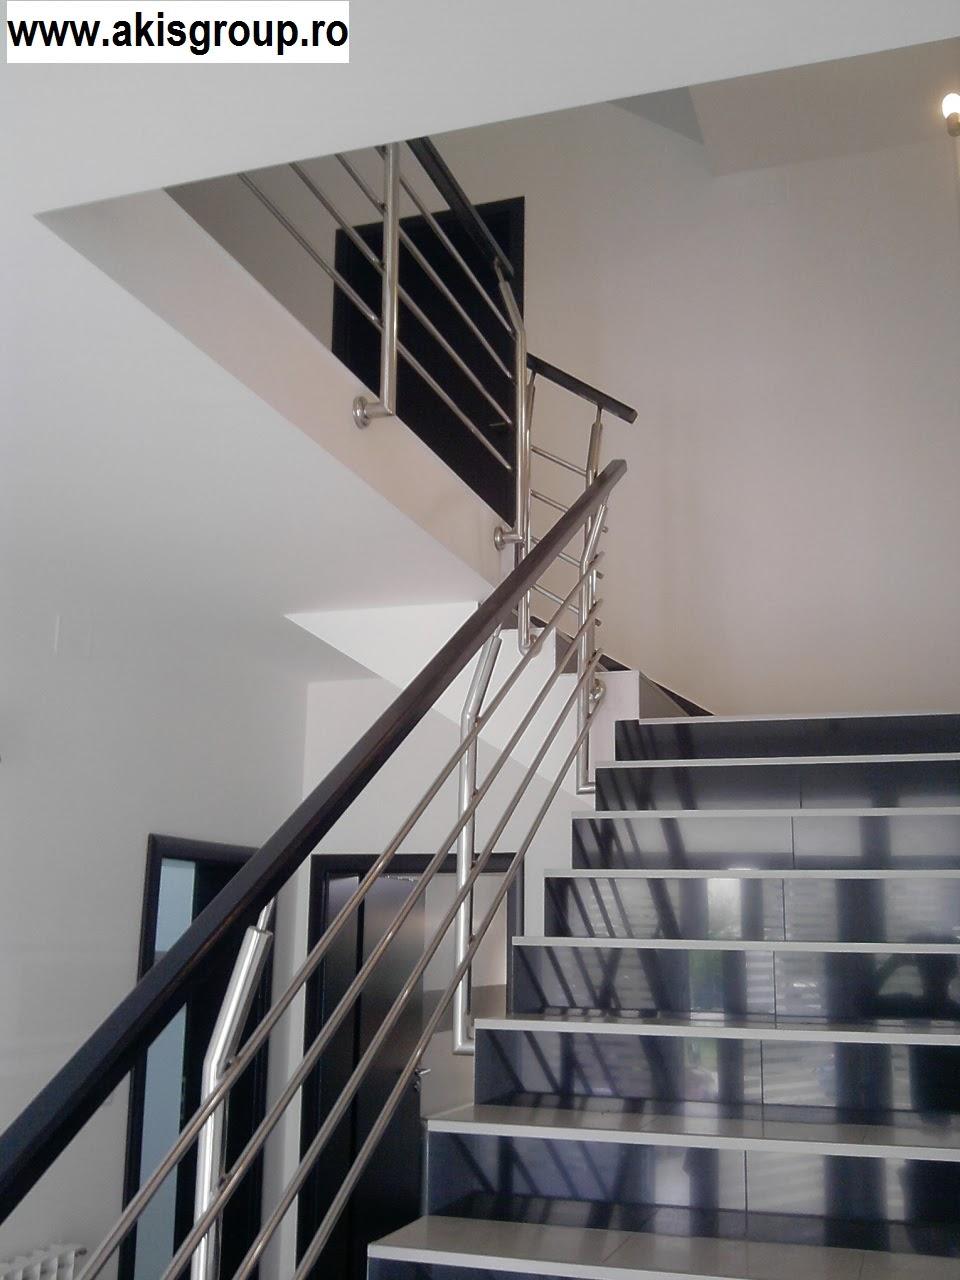 balustrade inox balustrade inox timisoara modele. Black Bedroom Furniture Sets. Home Design Ideas